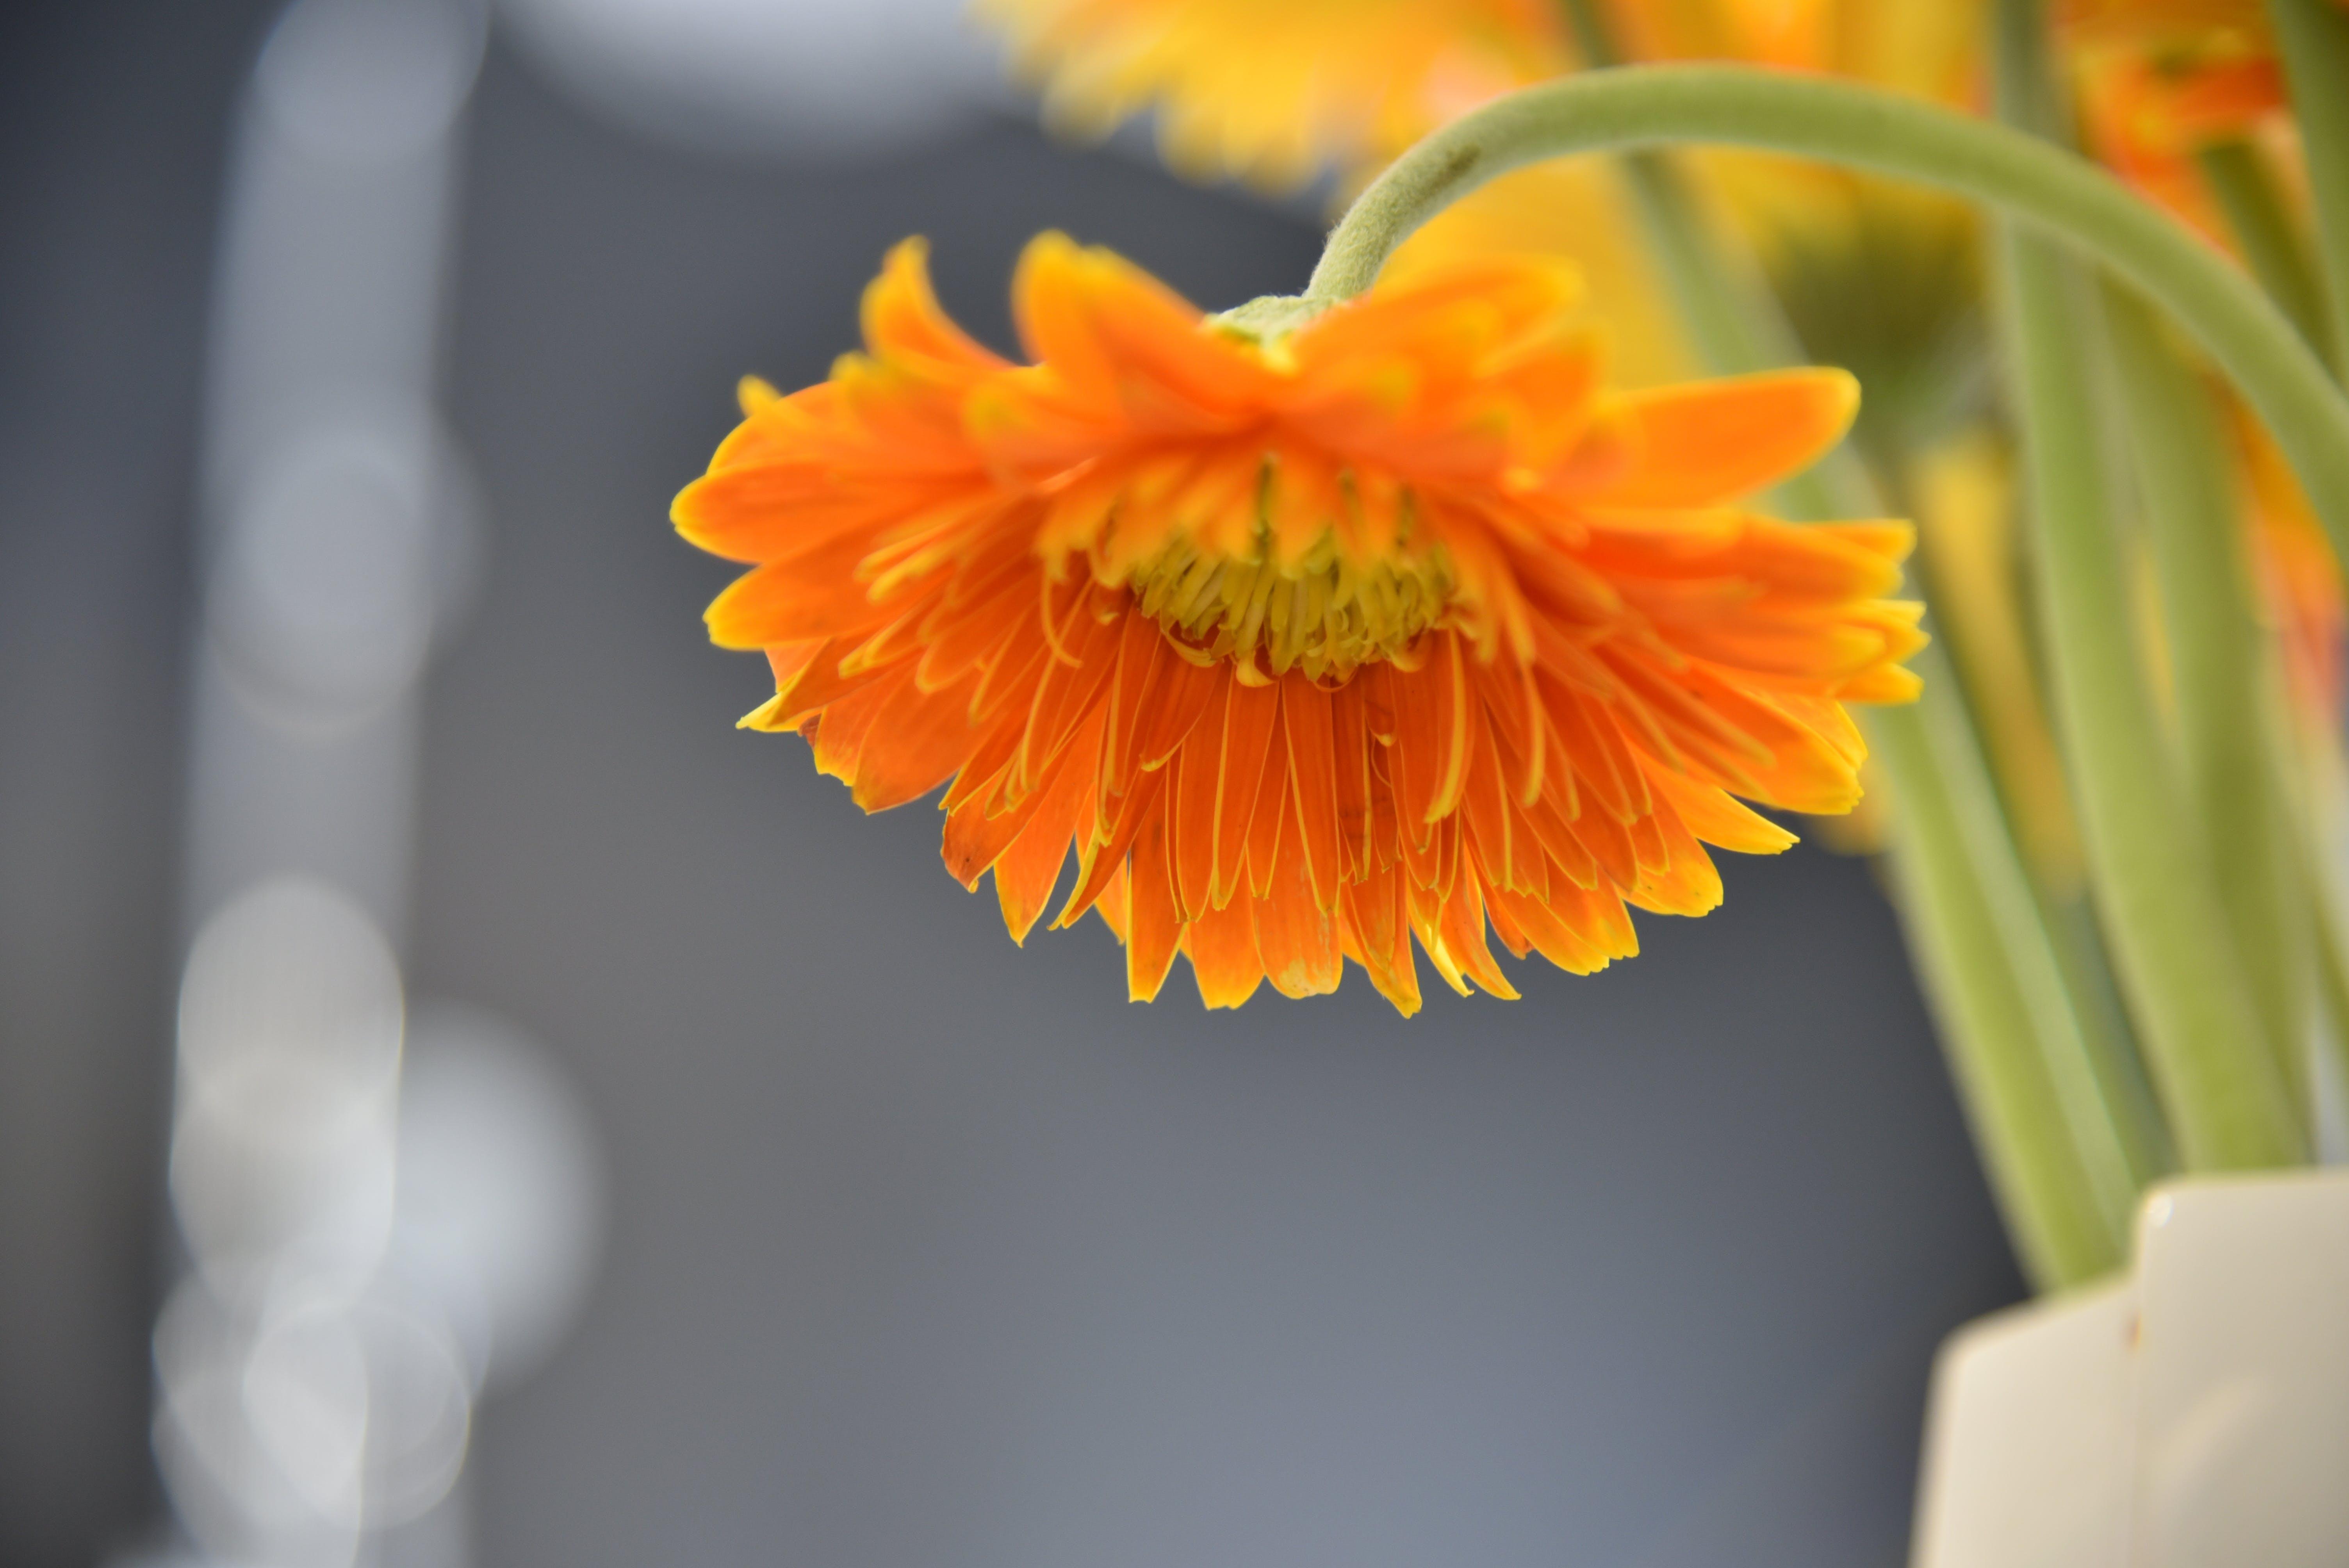 Orange Daisy Flower Selective Focus Photography